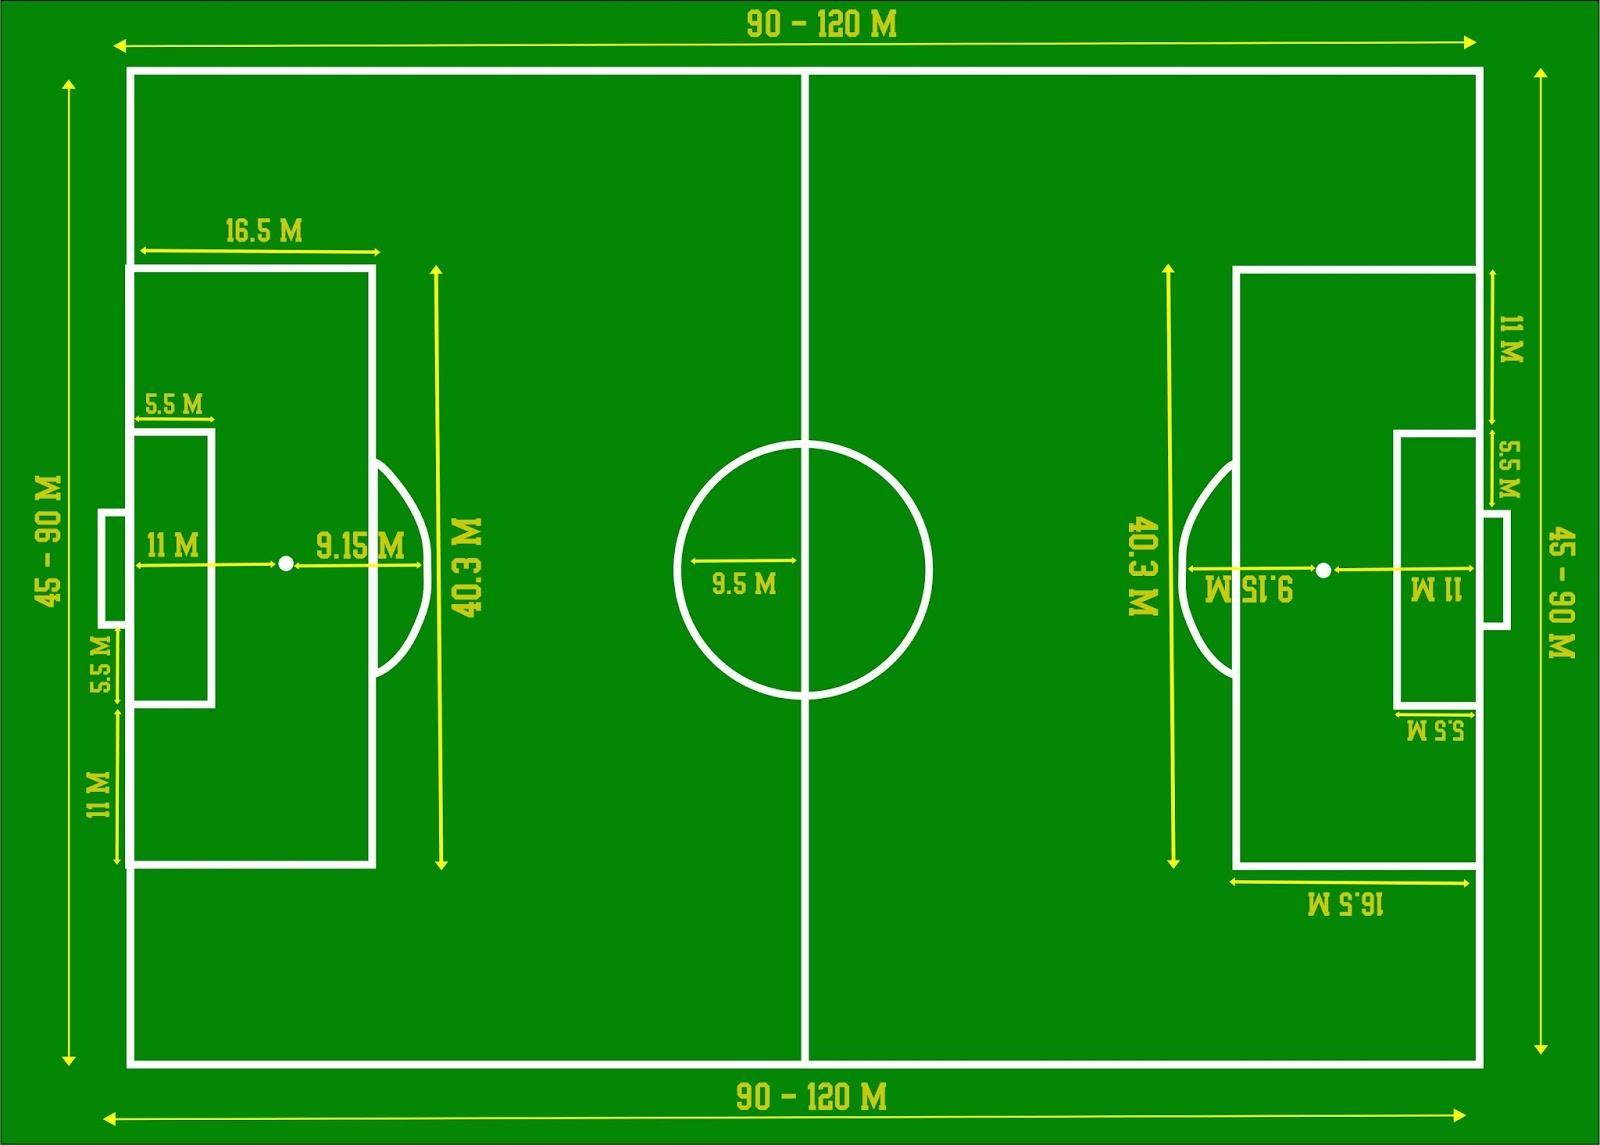 Ukuran Dan Jenis Lapangan Olahraga